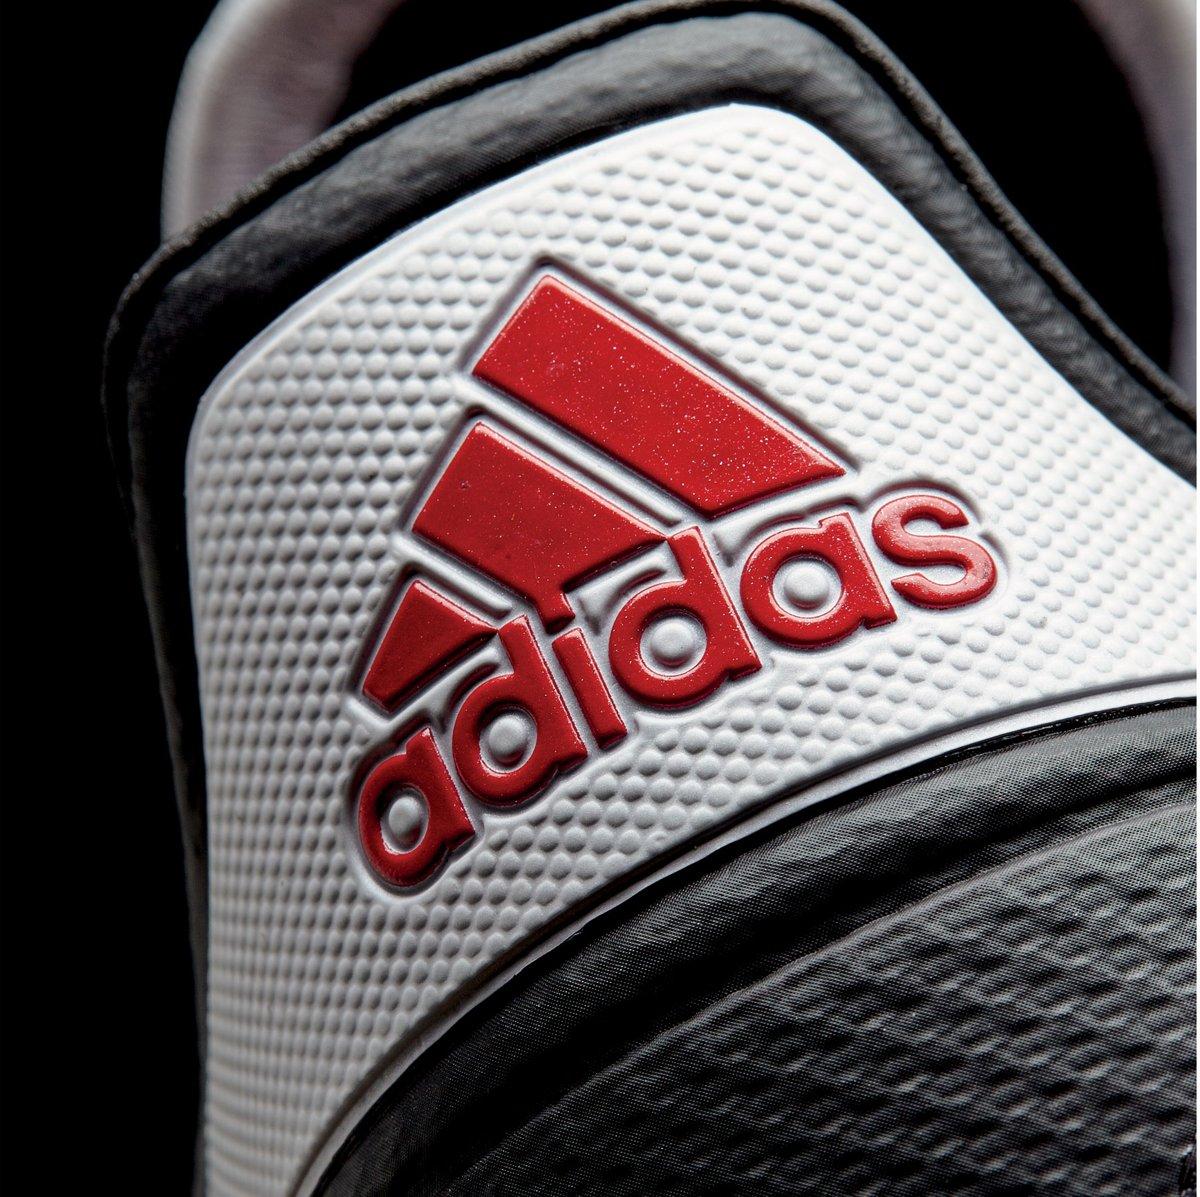 adidas Copa 17.1 FG Voetbalschoenen Maat 46 Mannen zwartwitrood